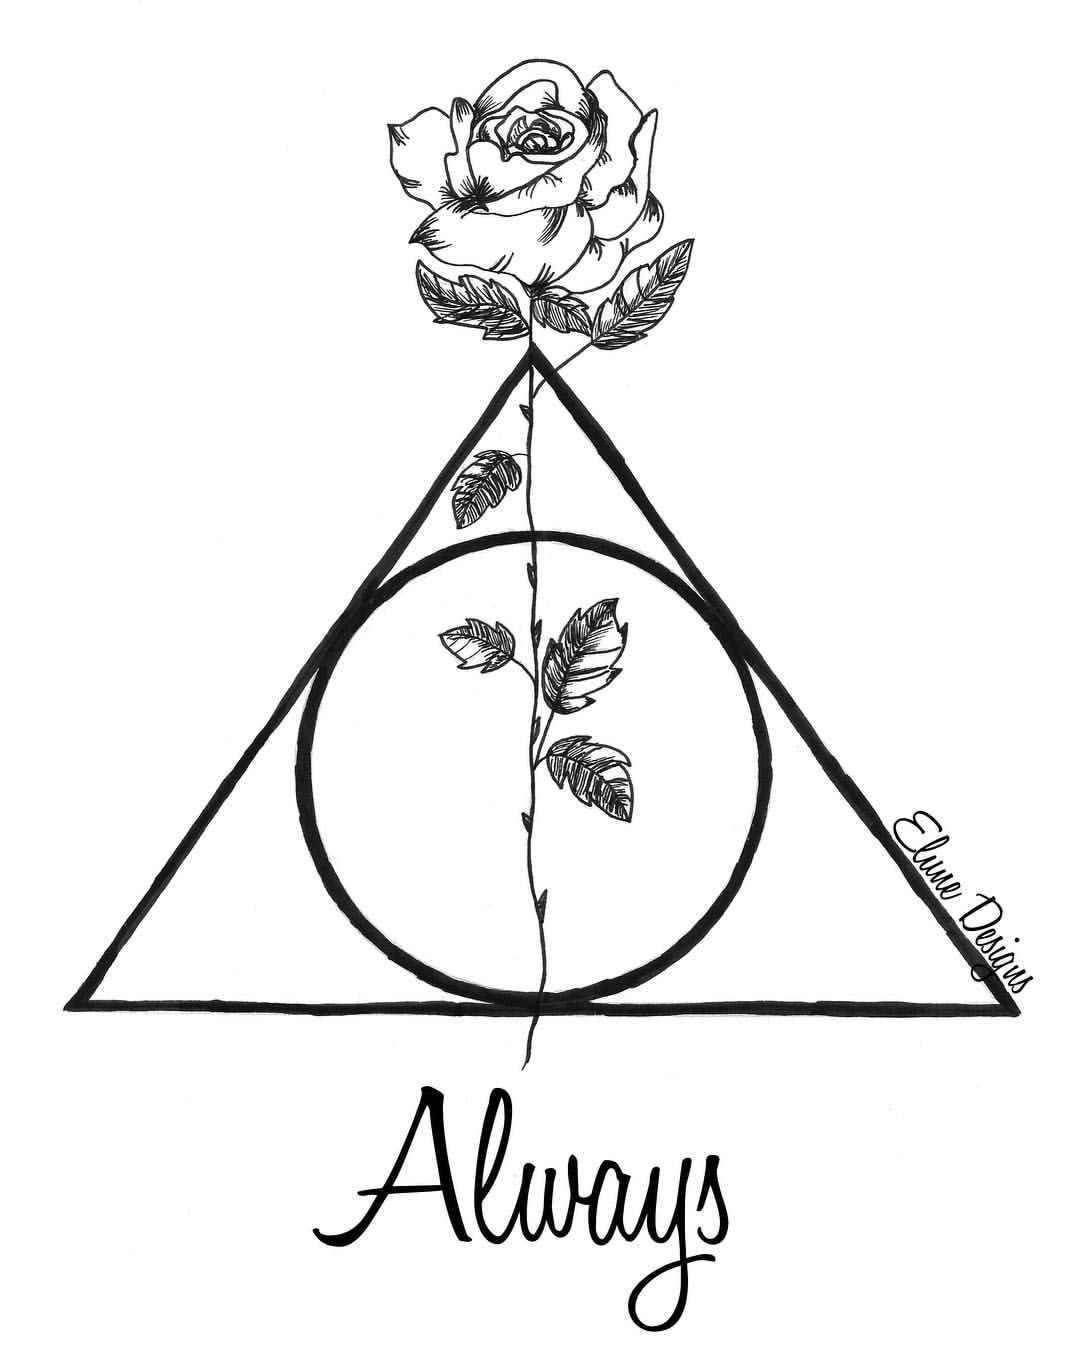 Harry Potter Deathly Hallows Symbol With Rose April Urquhart Diy Tattoo Permanent April On I Deathly Hallows Symbol Harry Potter Deathly Hallows Harry Potter